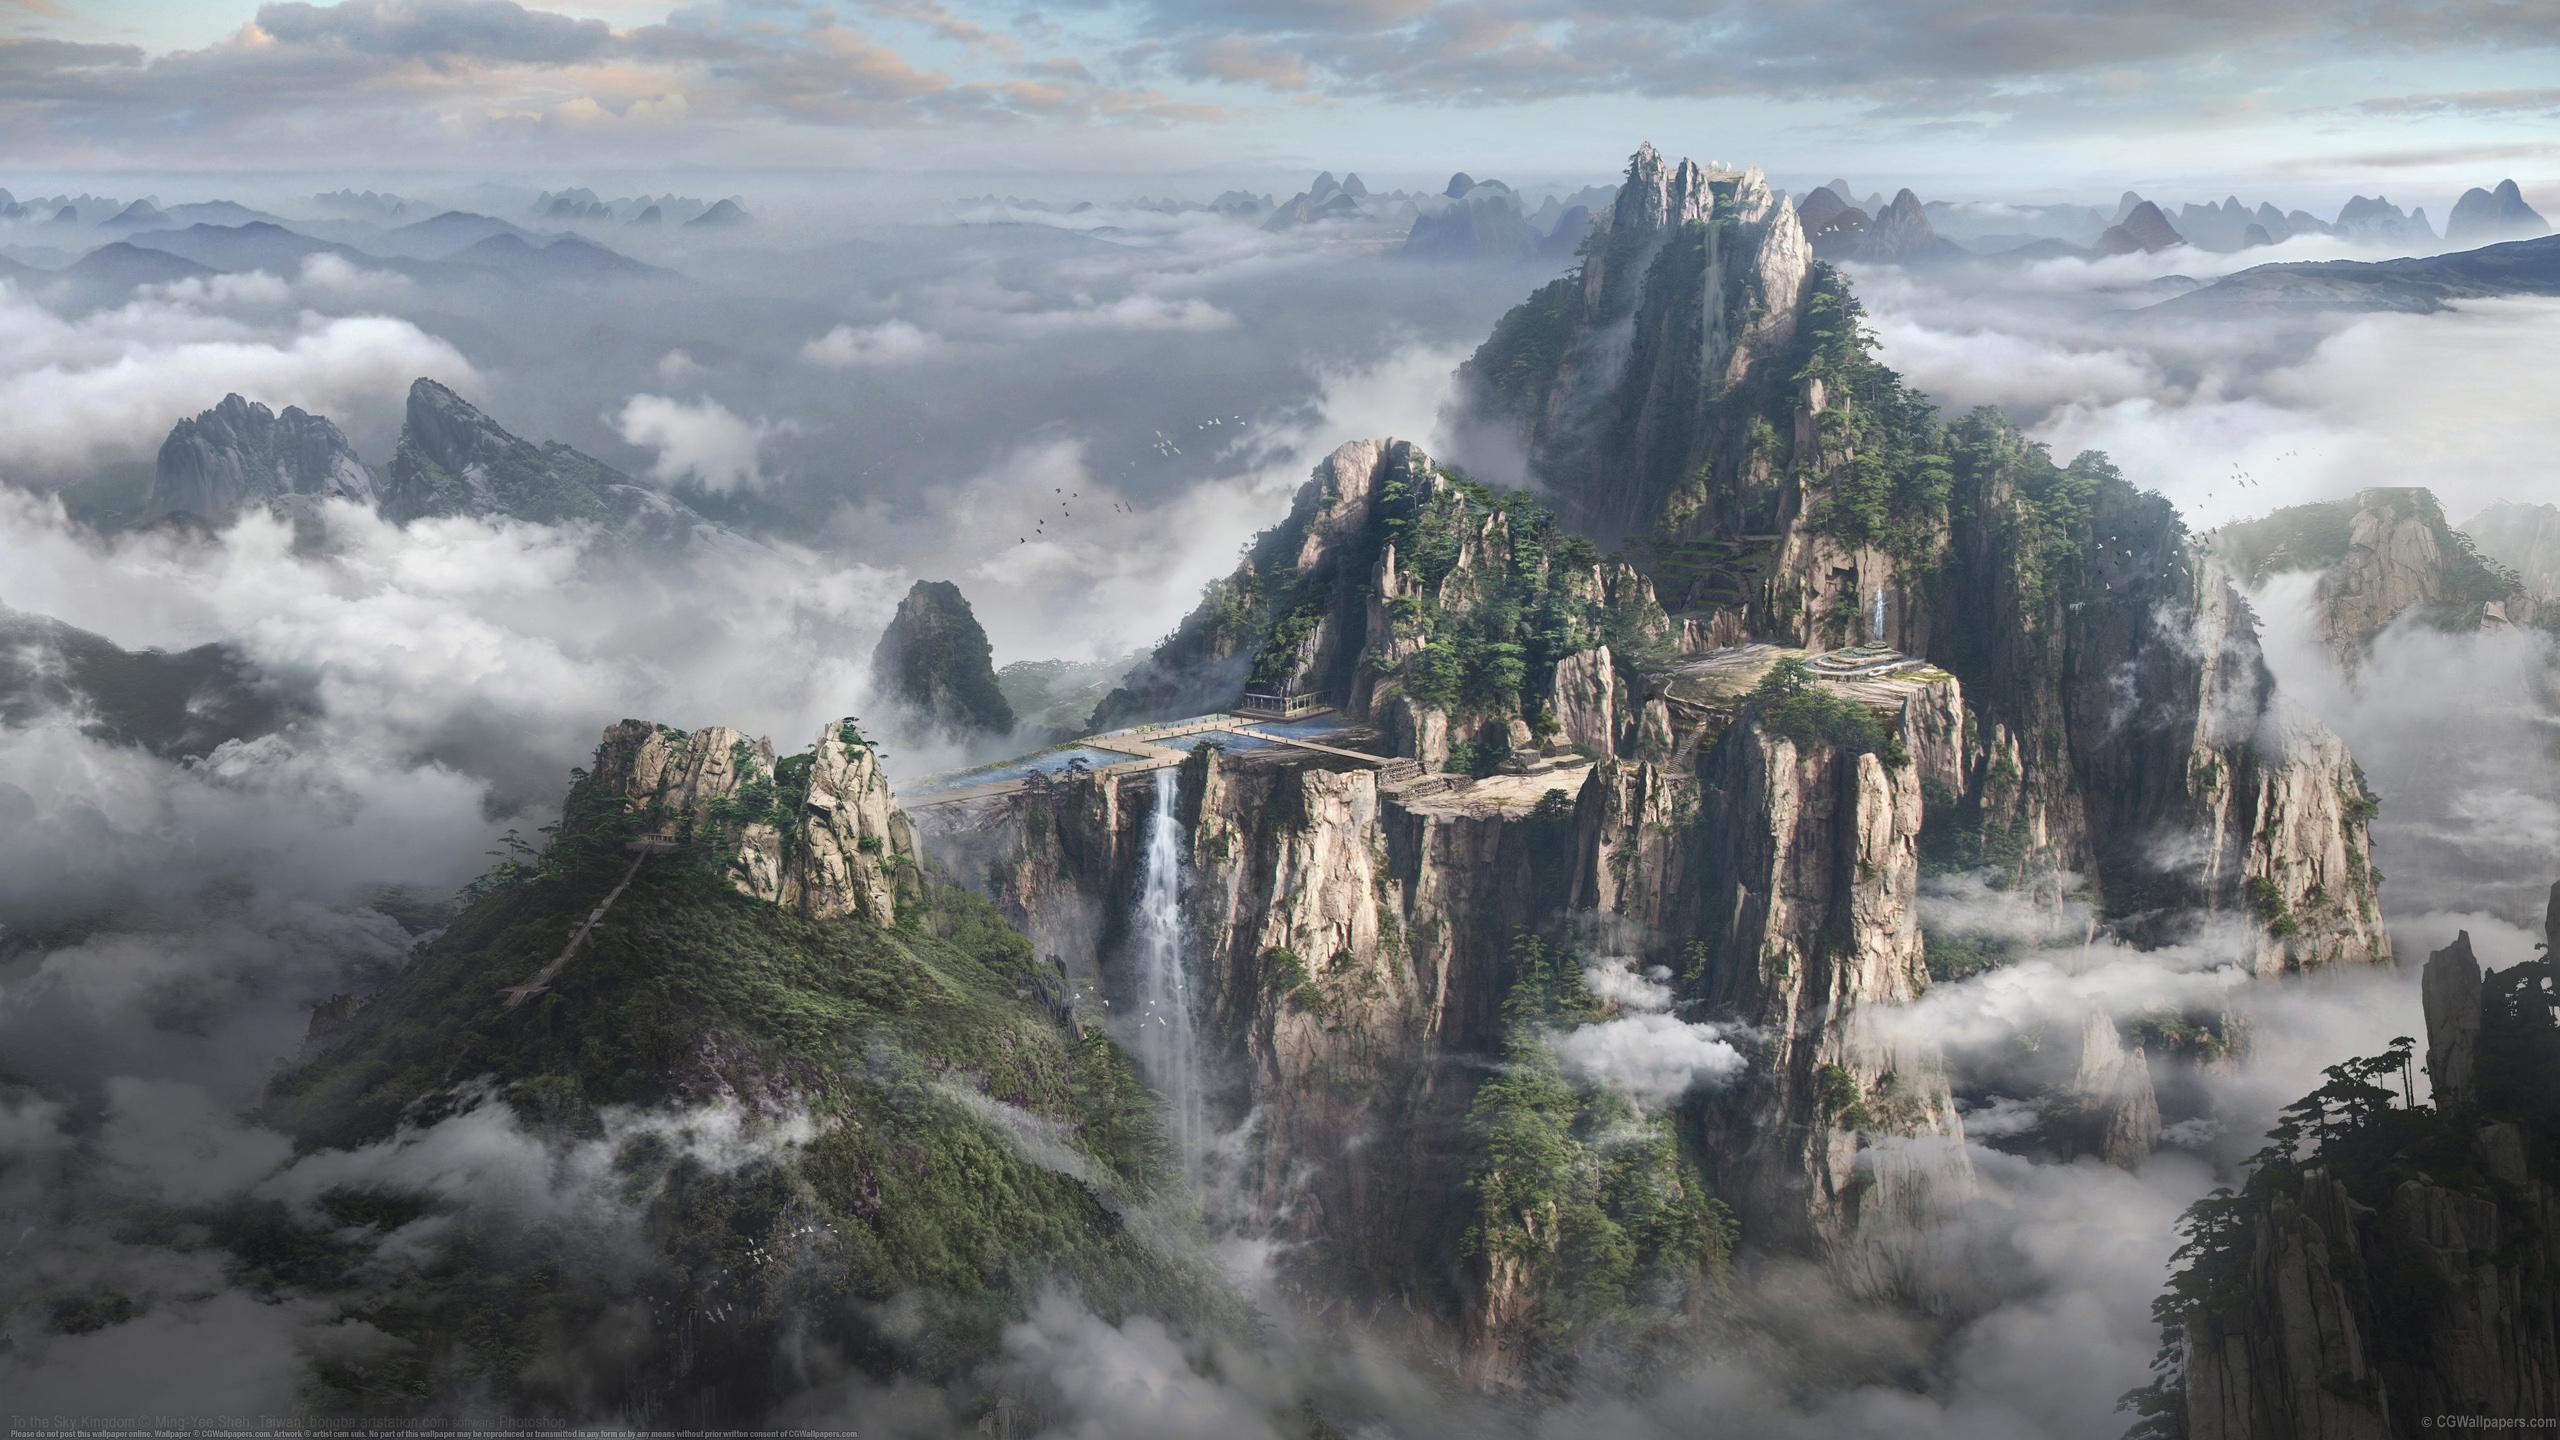 Ming-yee Sheh 2560x1440 wallpaper or background 03